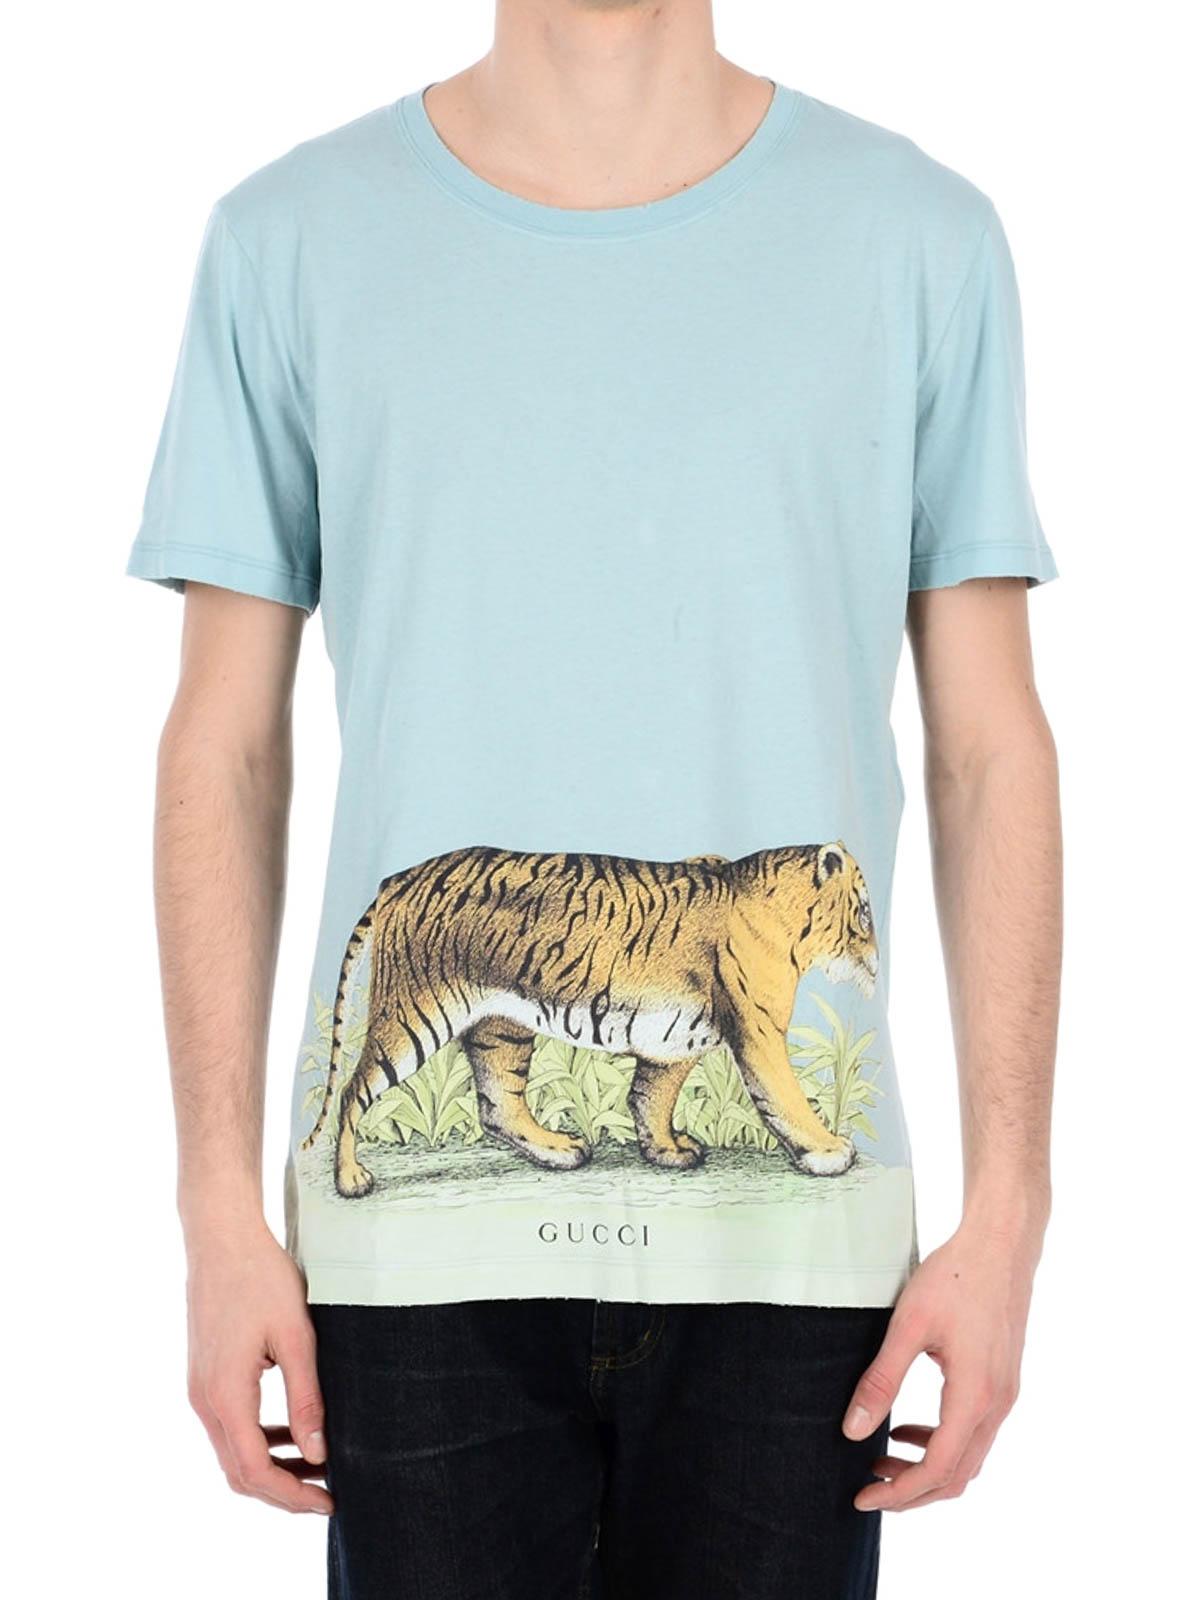 tiger print vintage t shirt by gucci t shirts ikrix. Black Bedroom Furniture Sets. Home Design Ideas